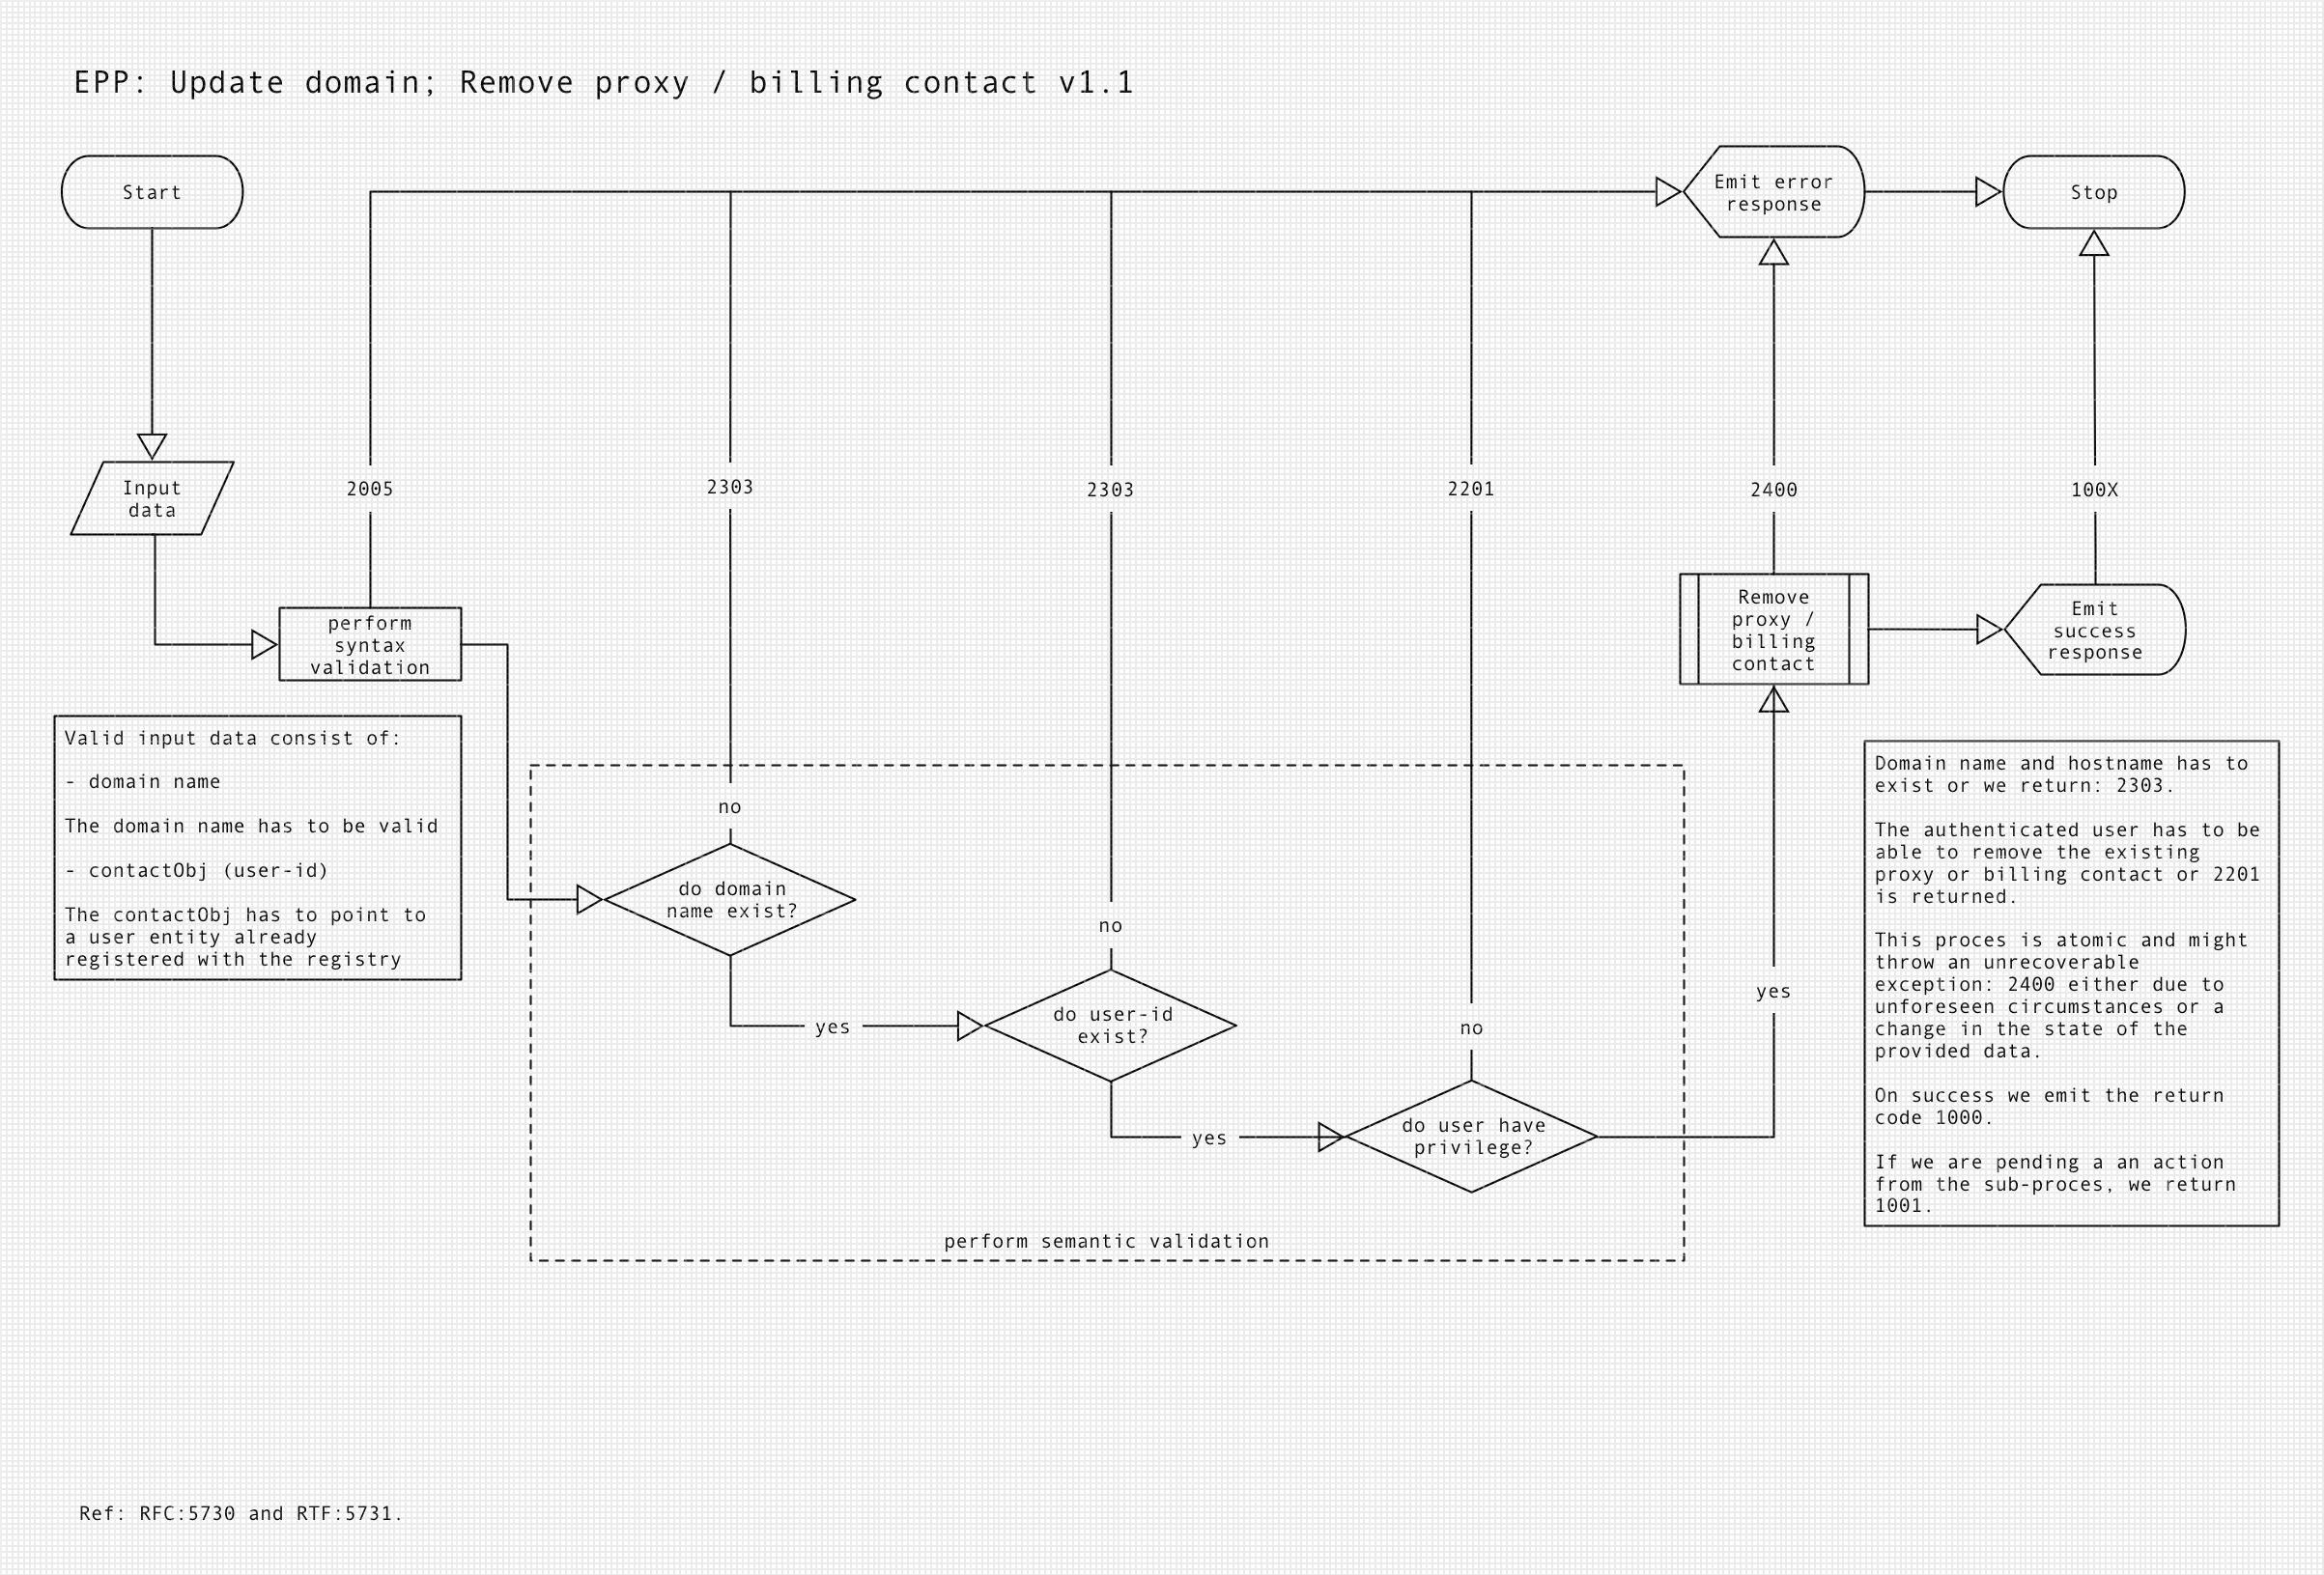 Update domain - Remove billing/admin contact